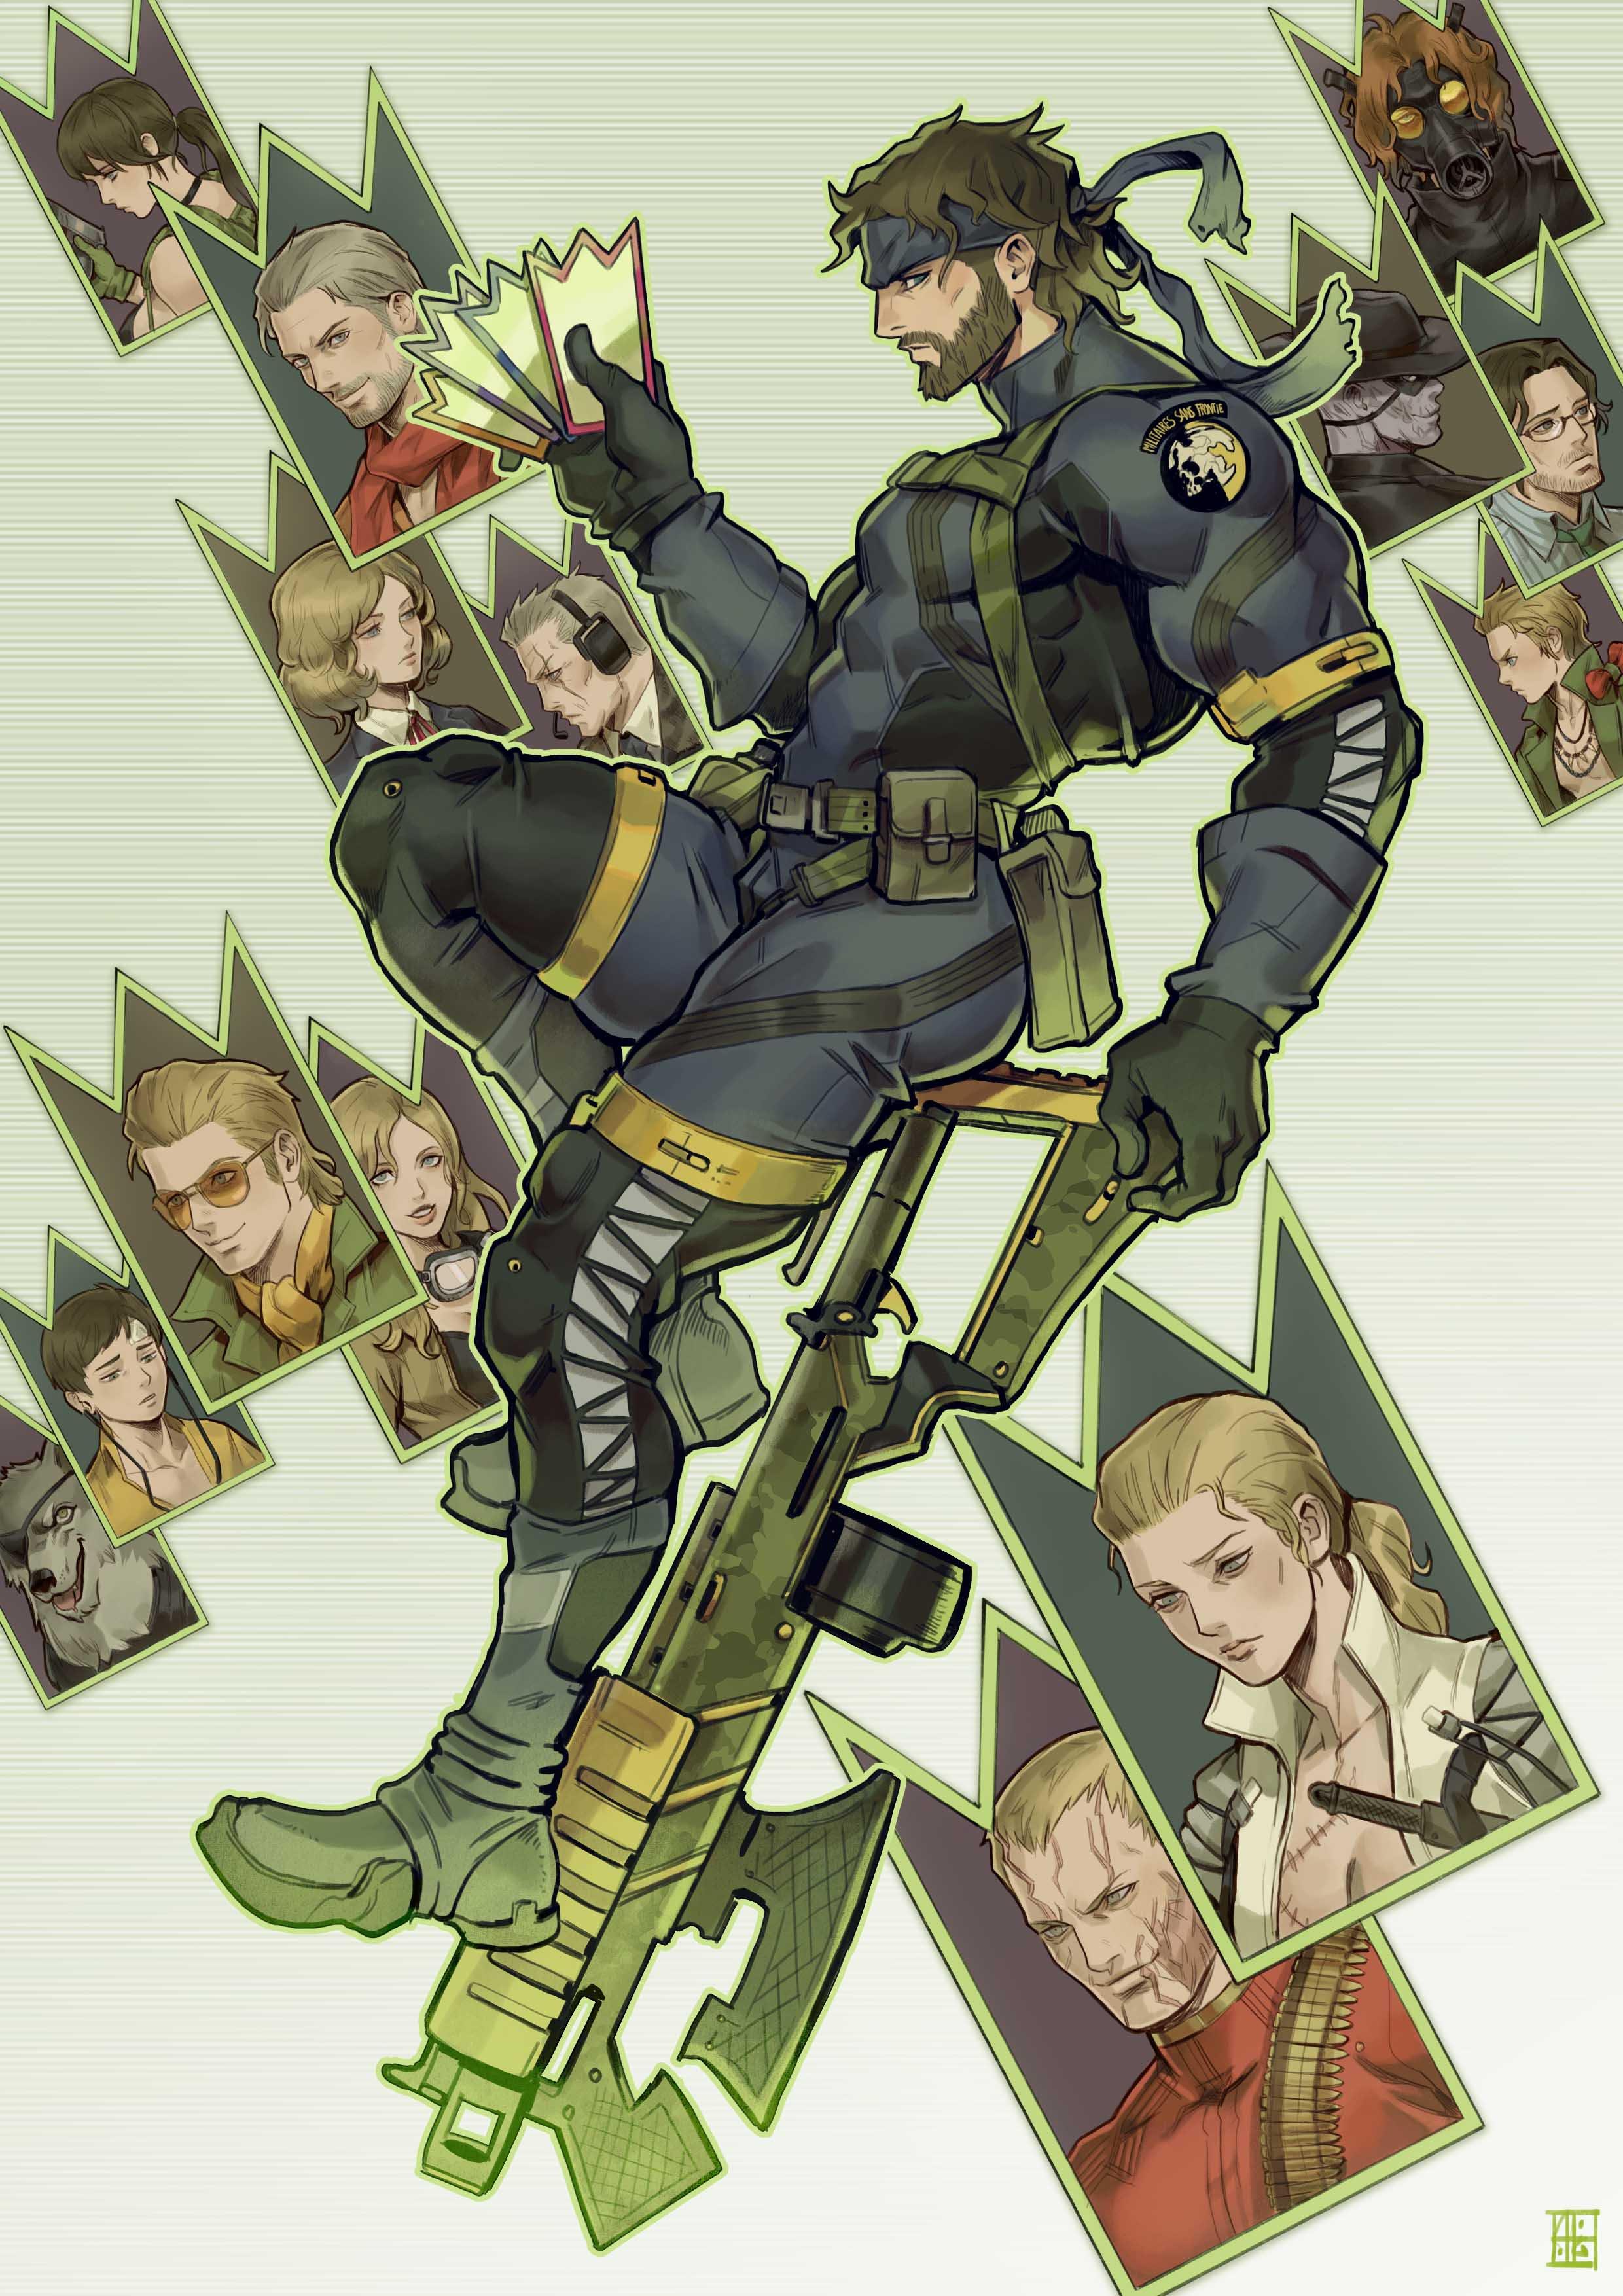 Kazuhira Miller Metal Gear Solid Zerochan Anime Image Board You should consider this for more than half a second, kazuhira miller. the cold metal of a gun was pressed against kaz. kazuhira miller metal gear solid